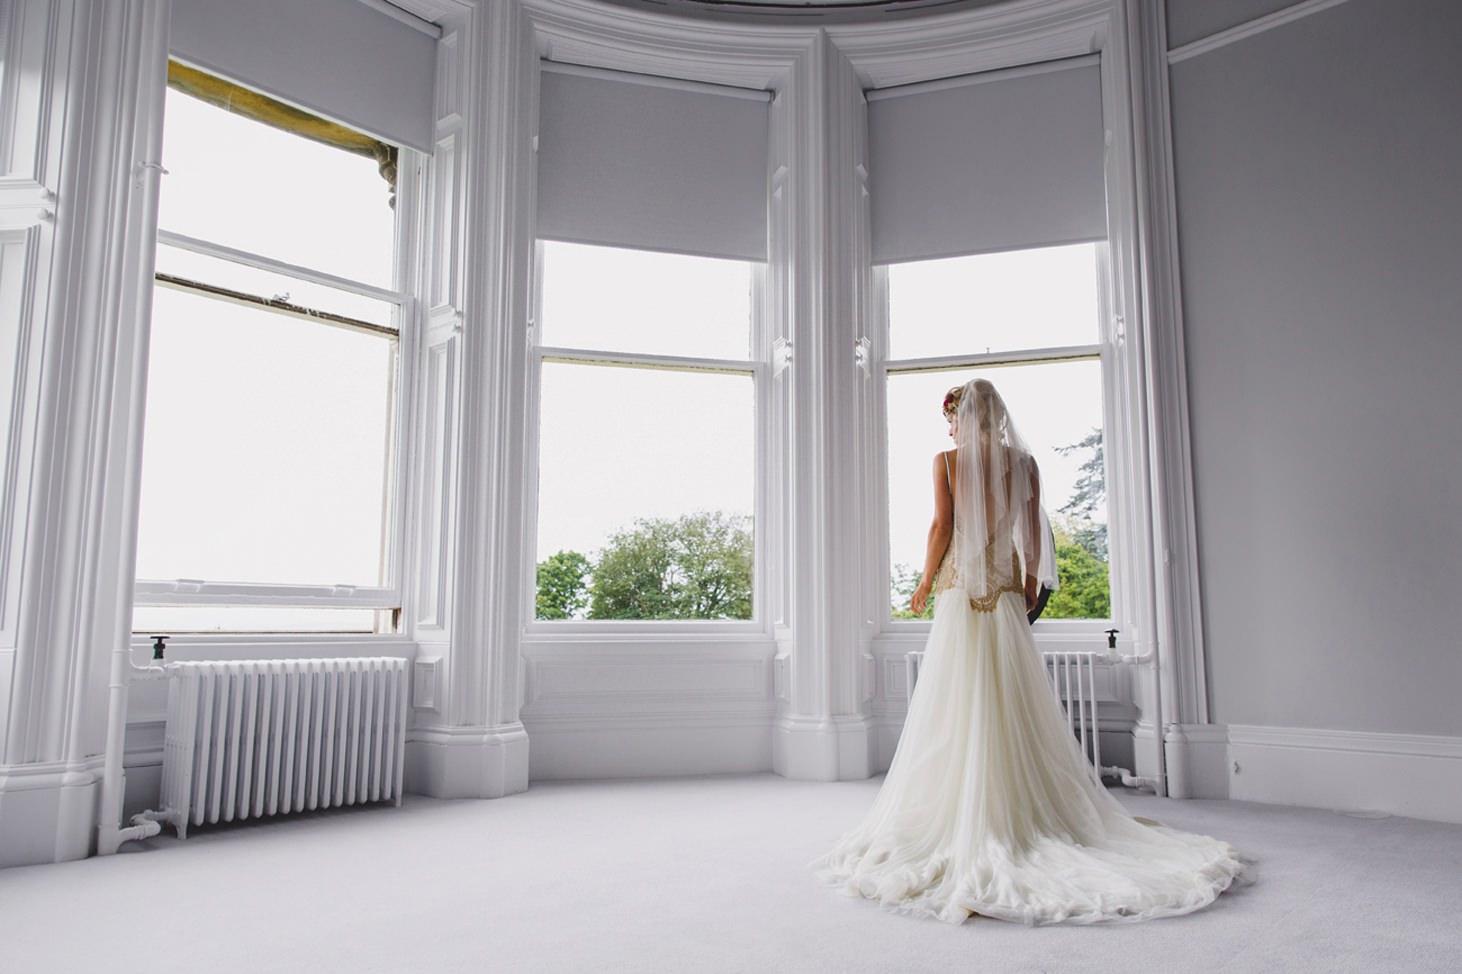 mount stuart wedding photography portrait of bride